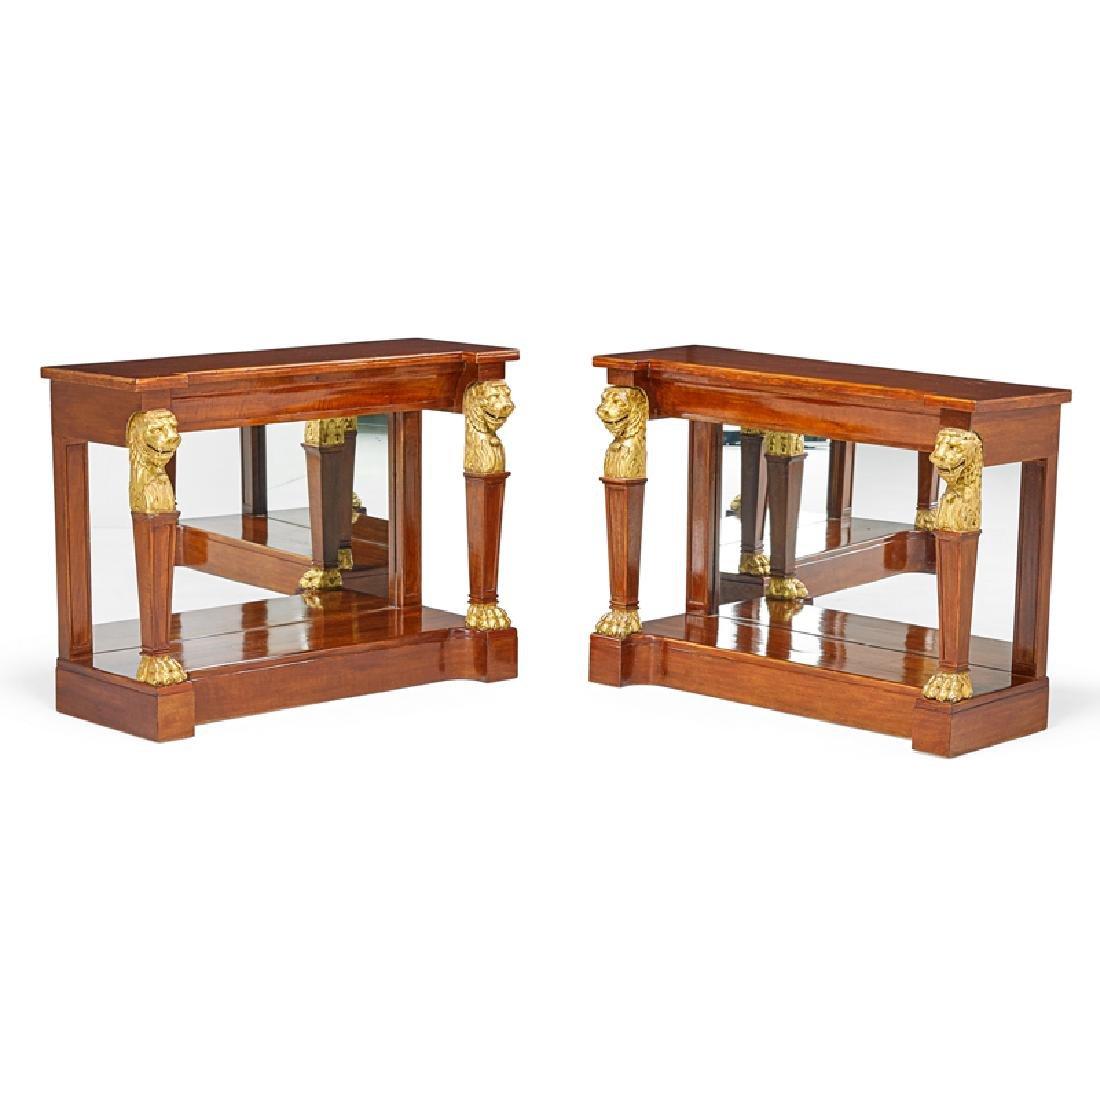 PAIR OF EMPIRE PARCEL GILT MAHOGANY CONSOLE TABLES